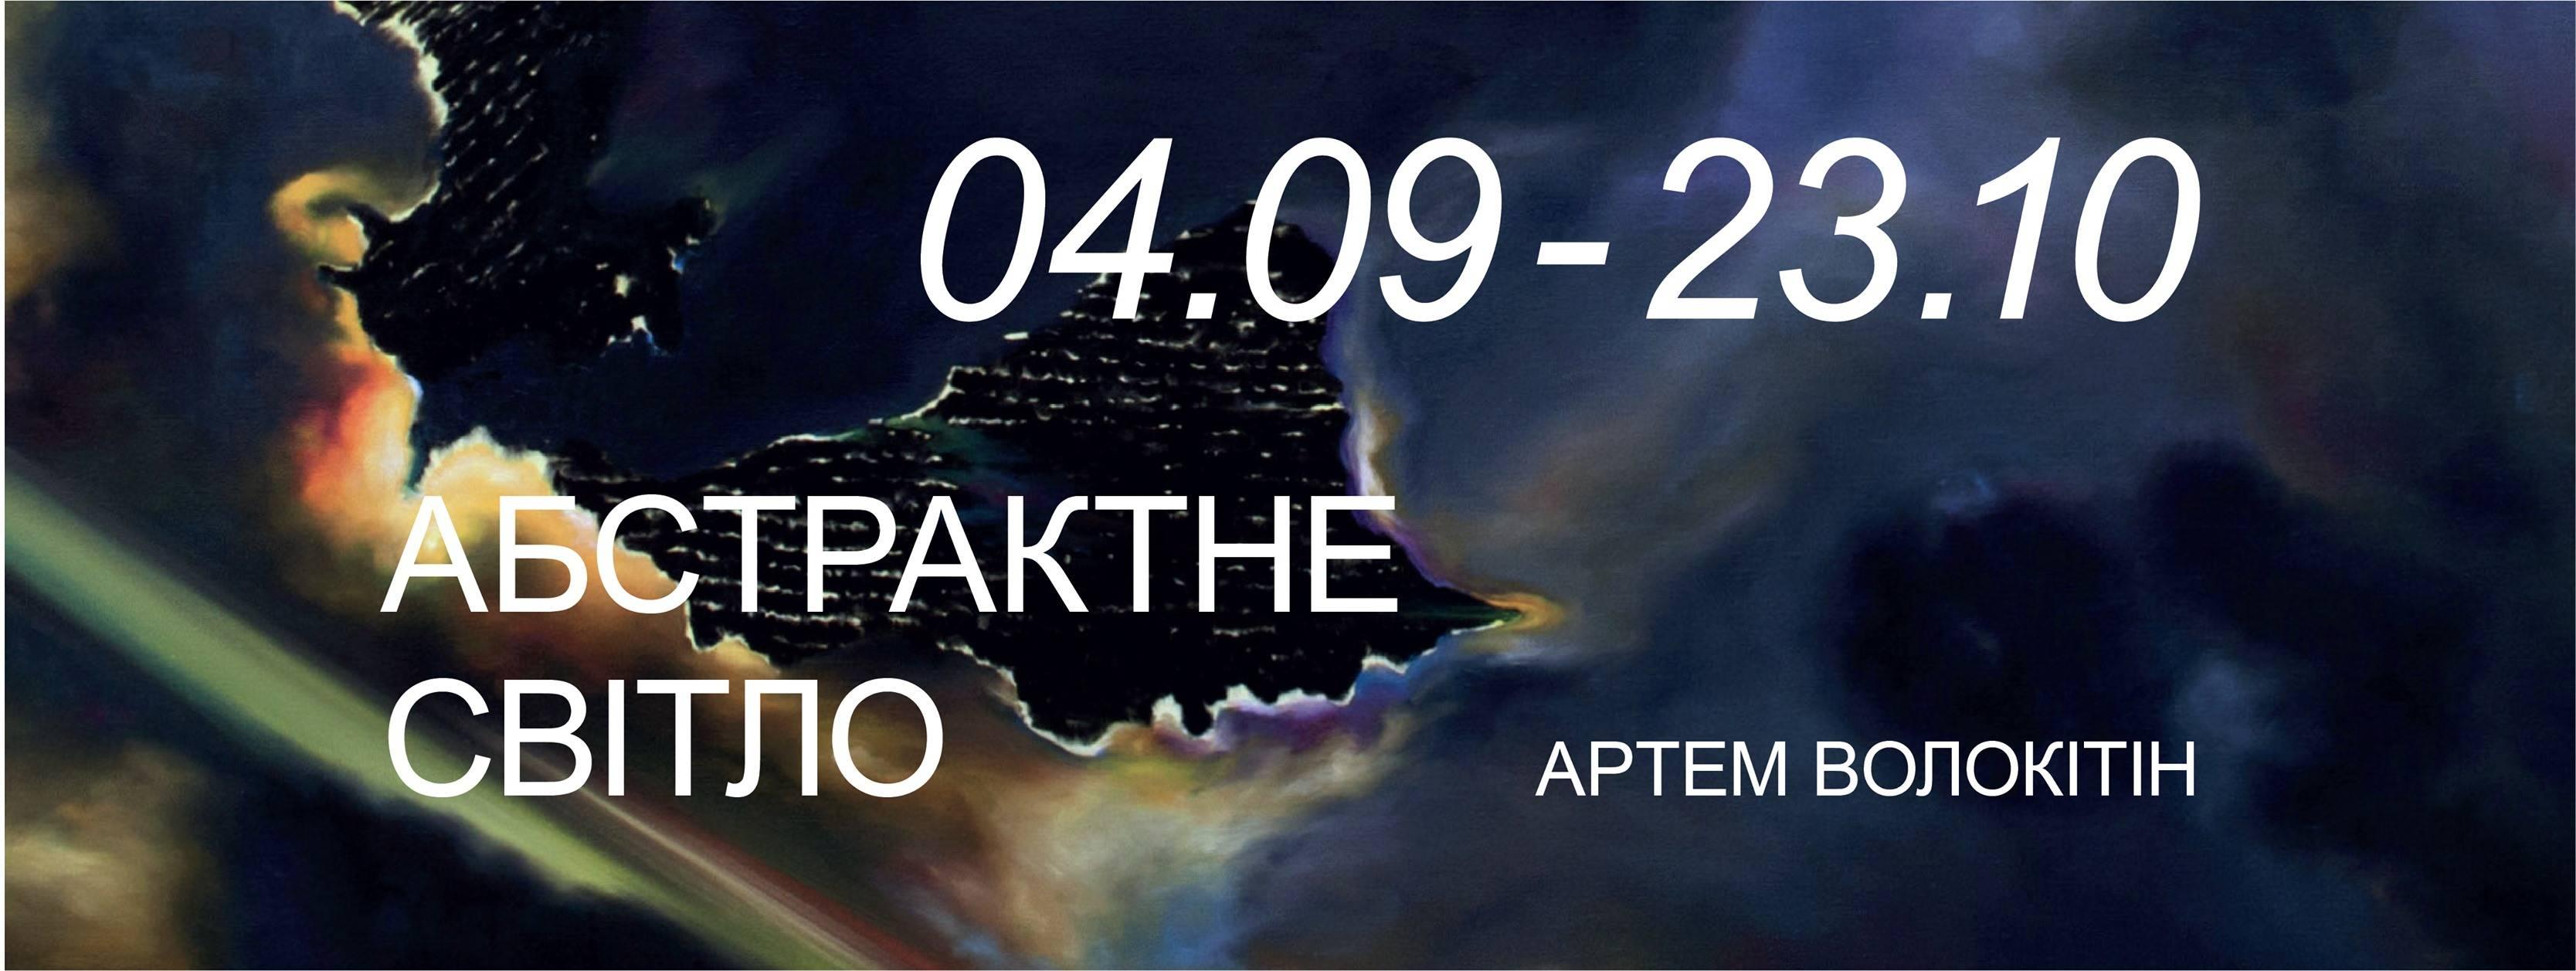 Артем Волокітін в NT-Art Gallery (Одеса)